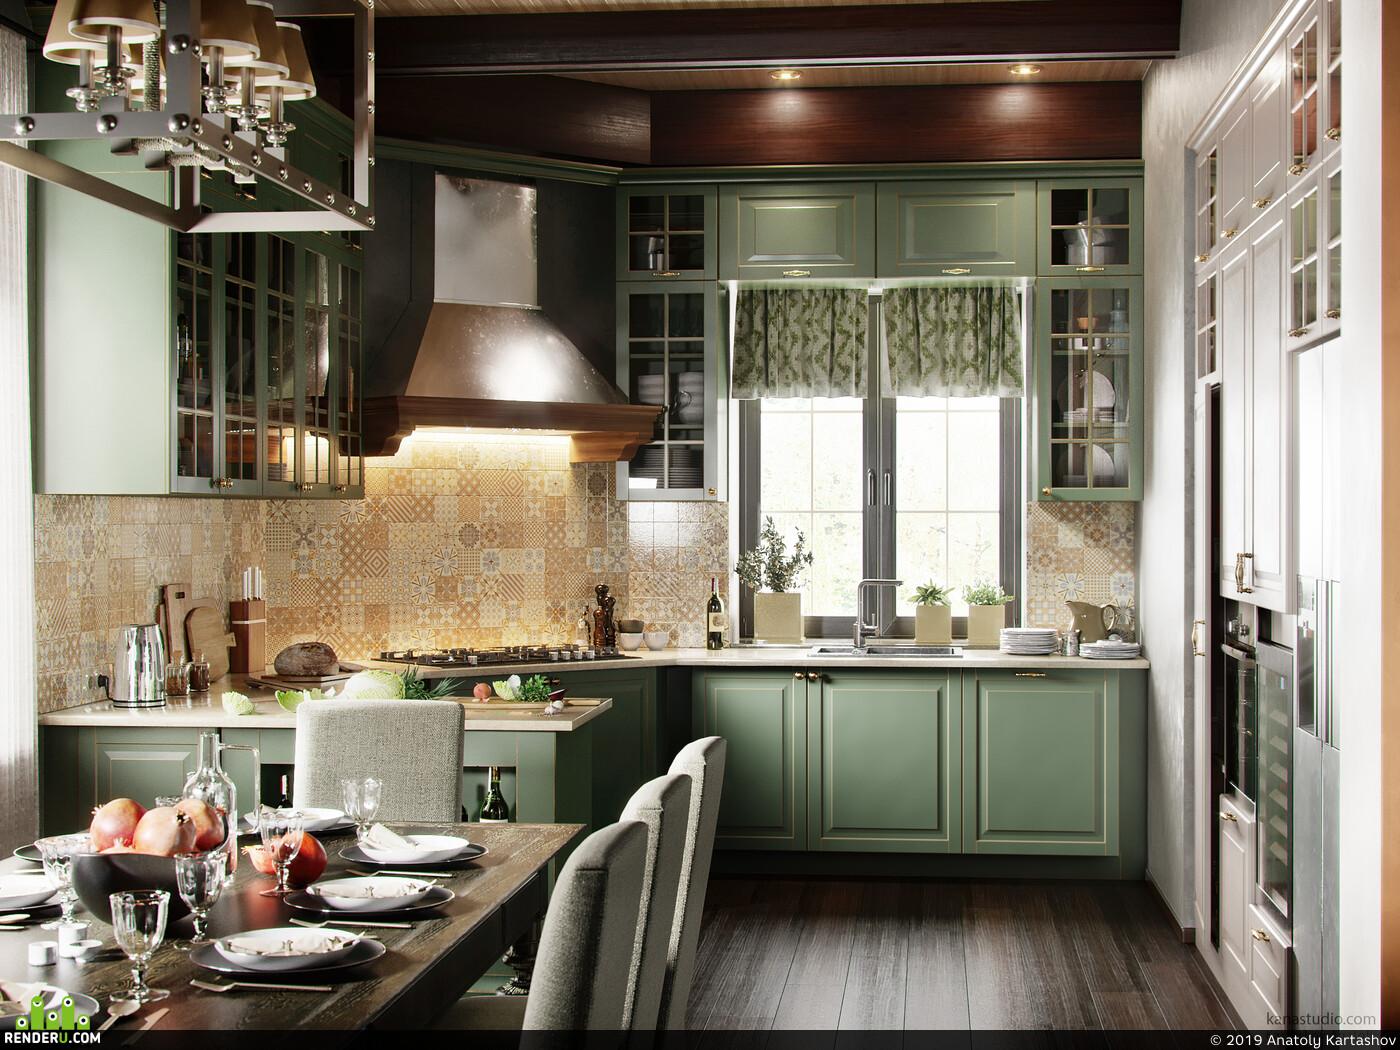 3Dsmax, Corona Renderer, interior, интерьер, Adobe Photoshop